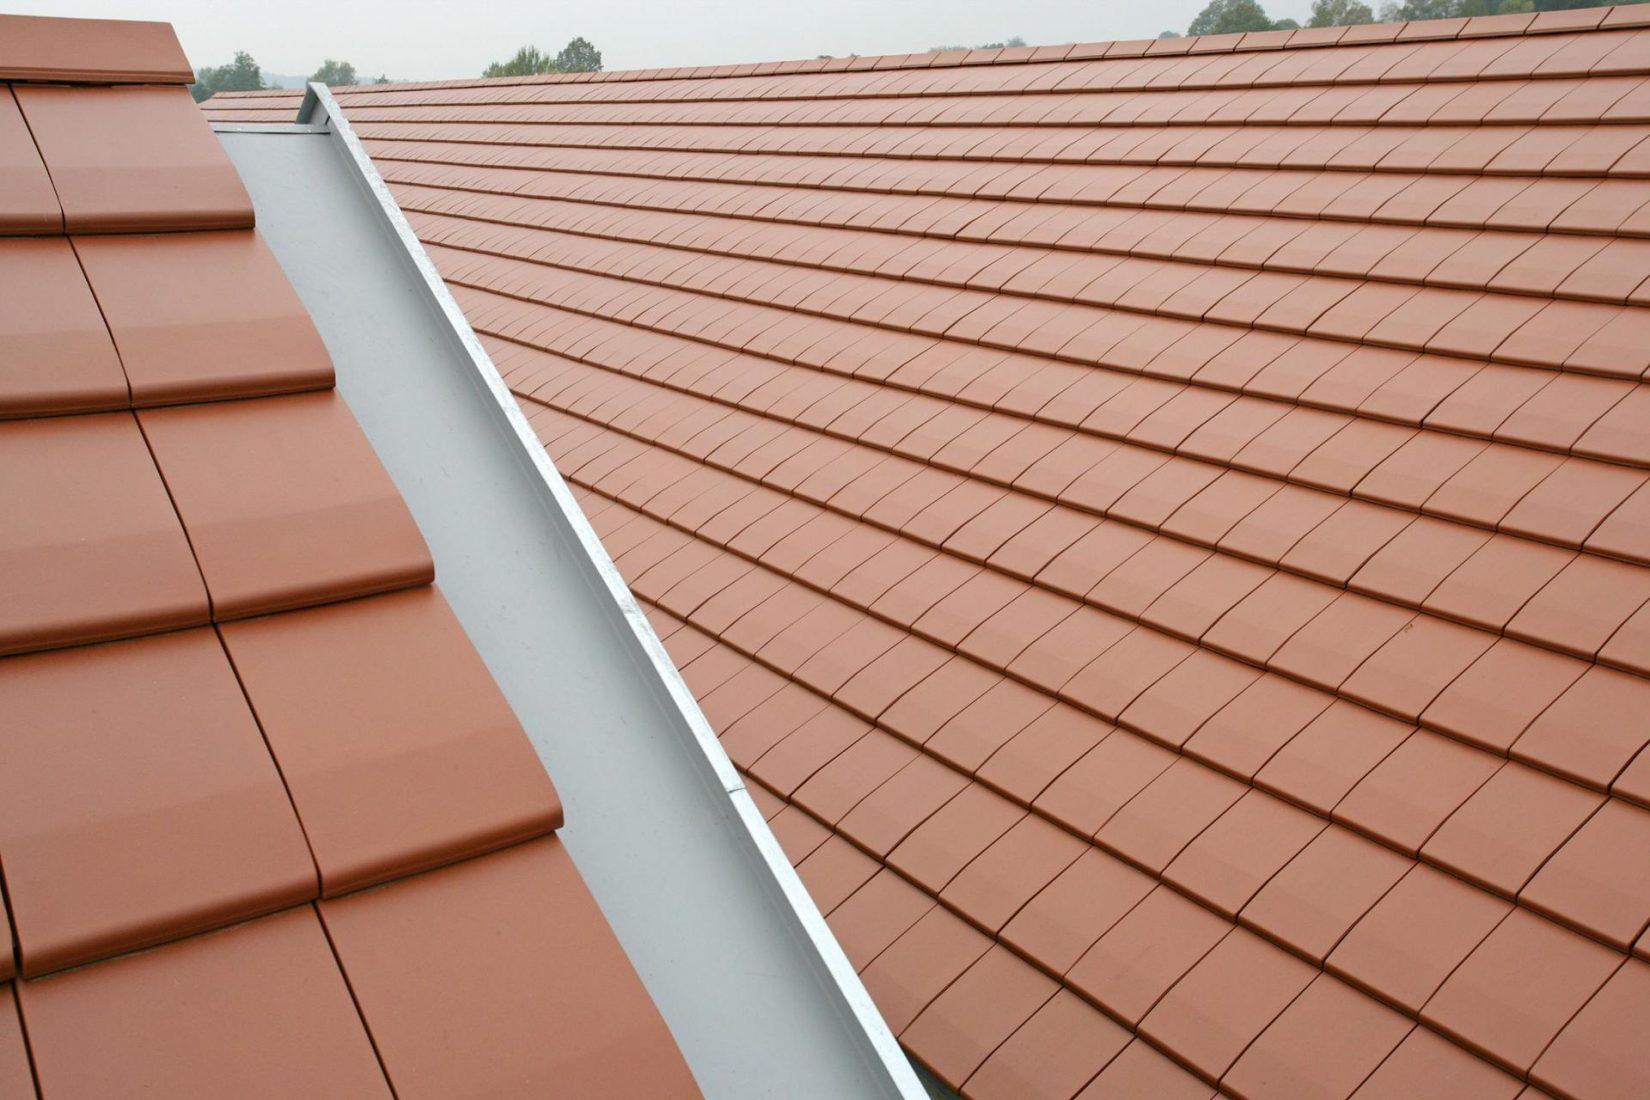 Senkrechte Ortgangrinne am seitlichen Abschluss des Daches. Foto: Wienerberger